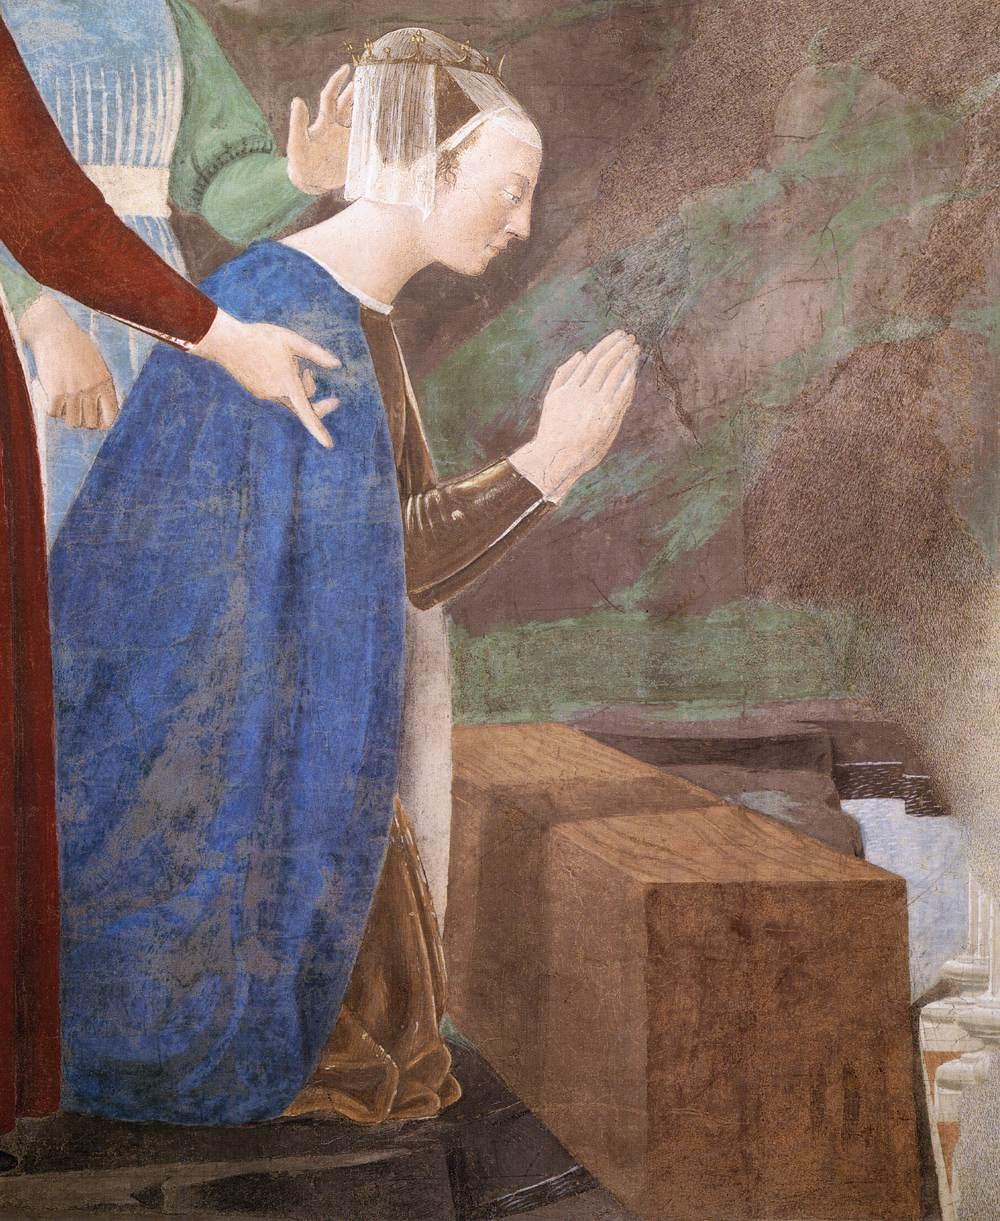 Piero della Francesca - 2a. Procession of the Queen of Sheba (detail) - WGA17490.jpg